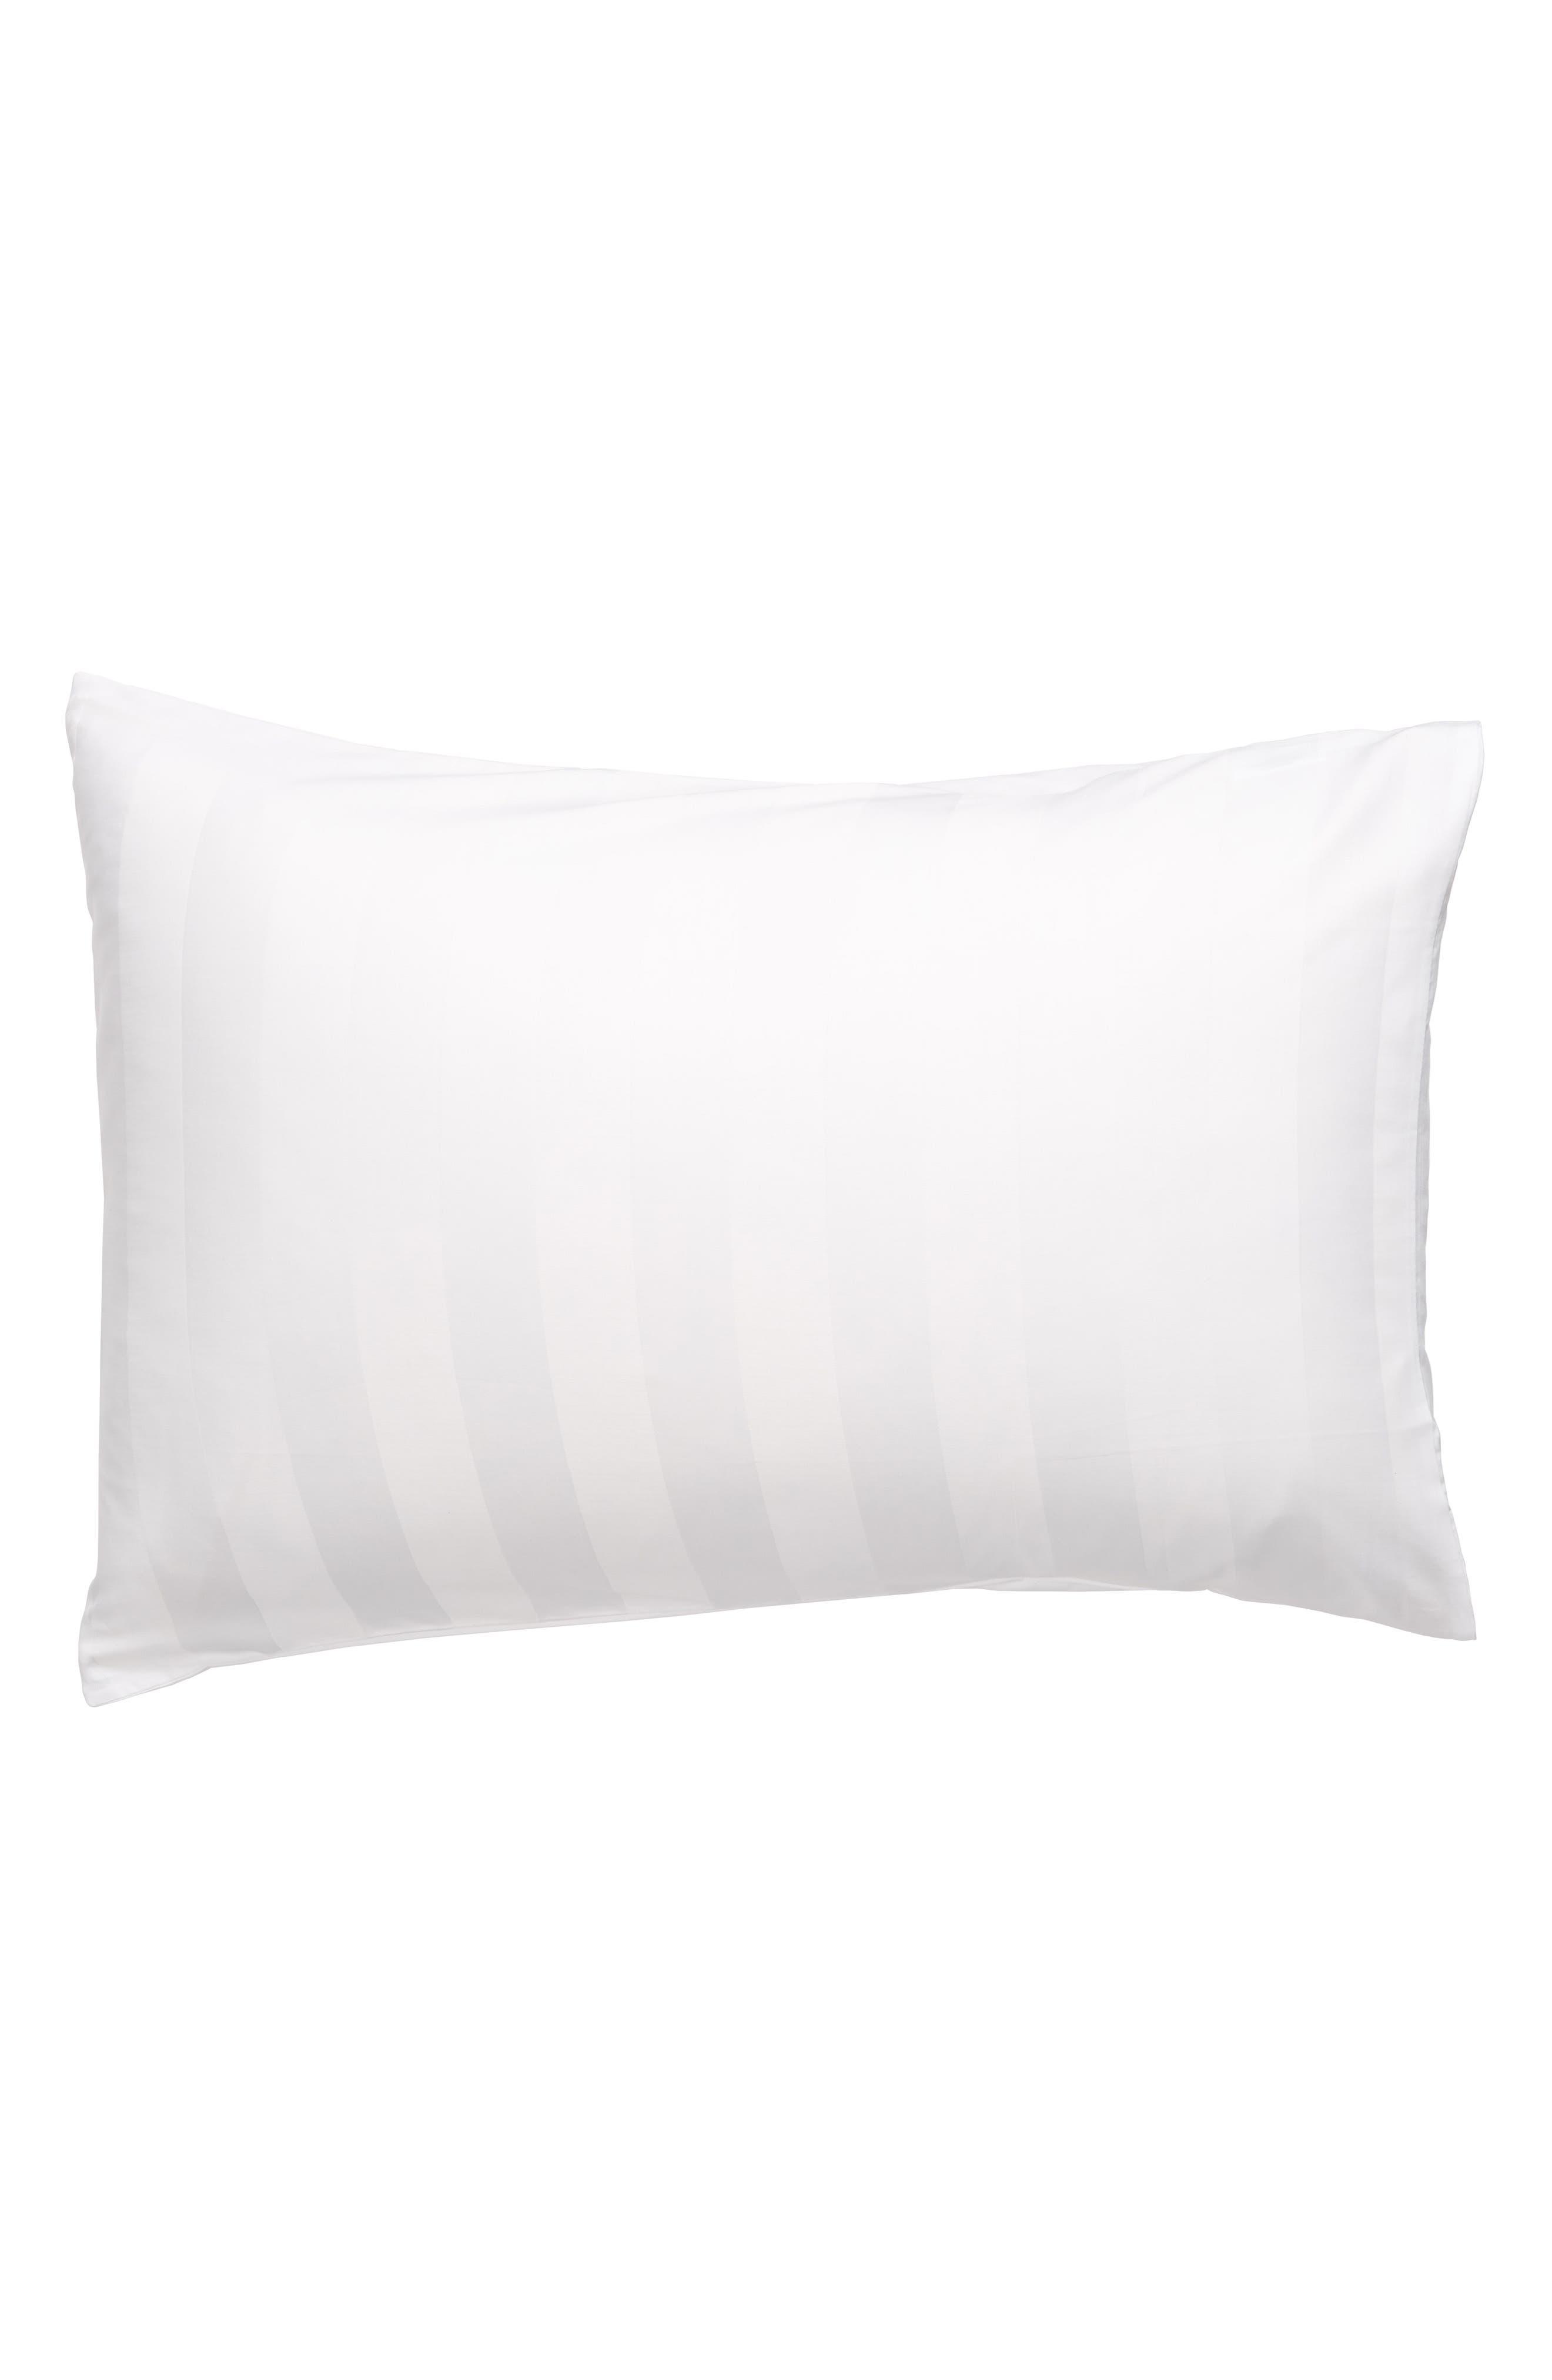 Home The Flag Pillow Sham,                             Main thumbnail 1, color,                             White